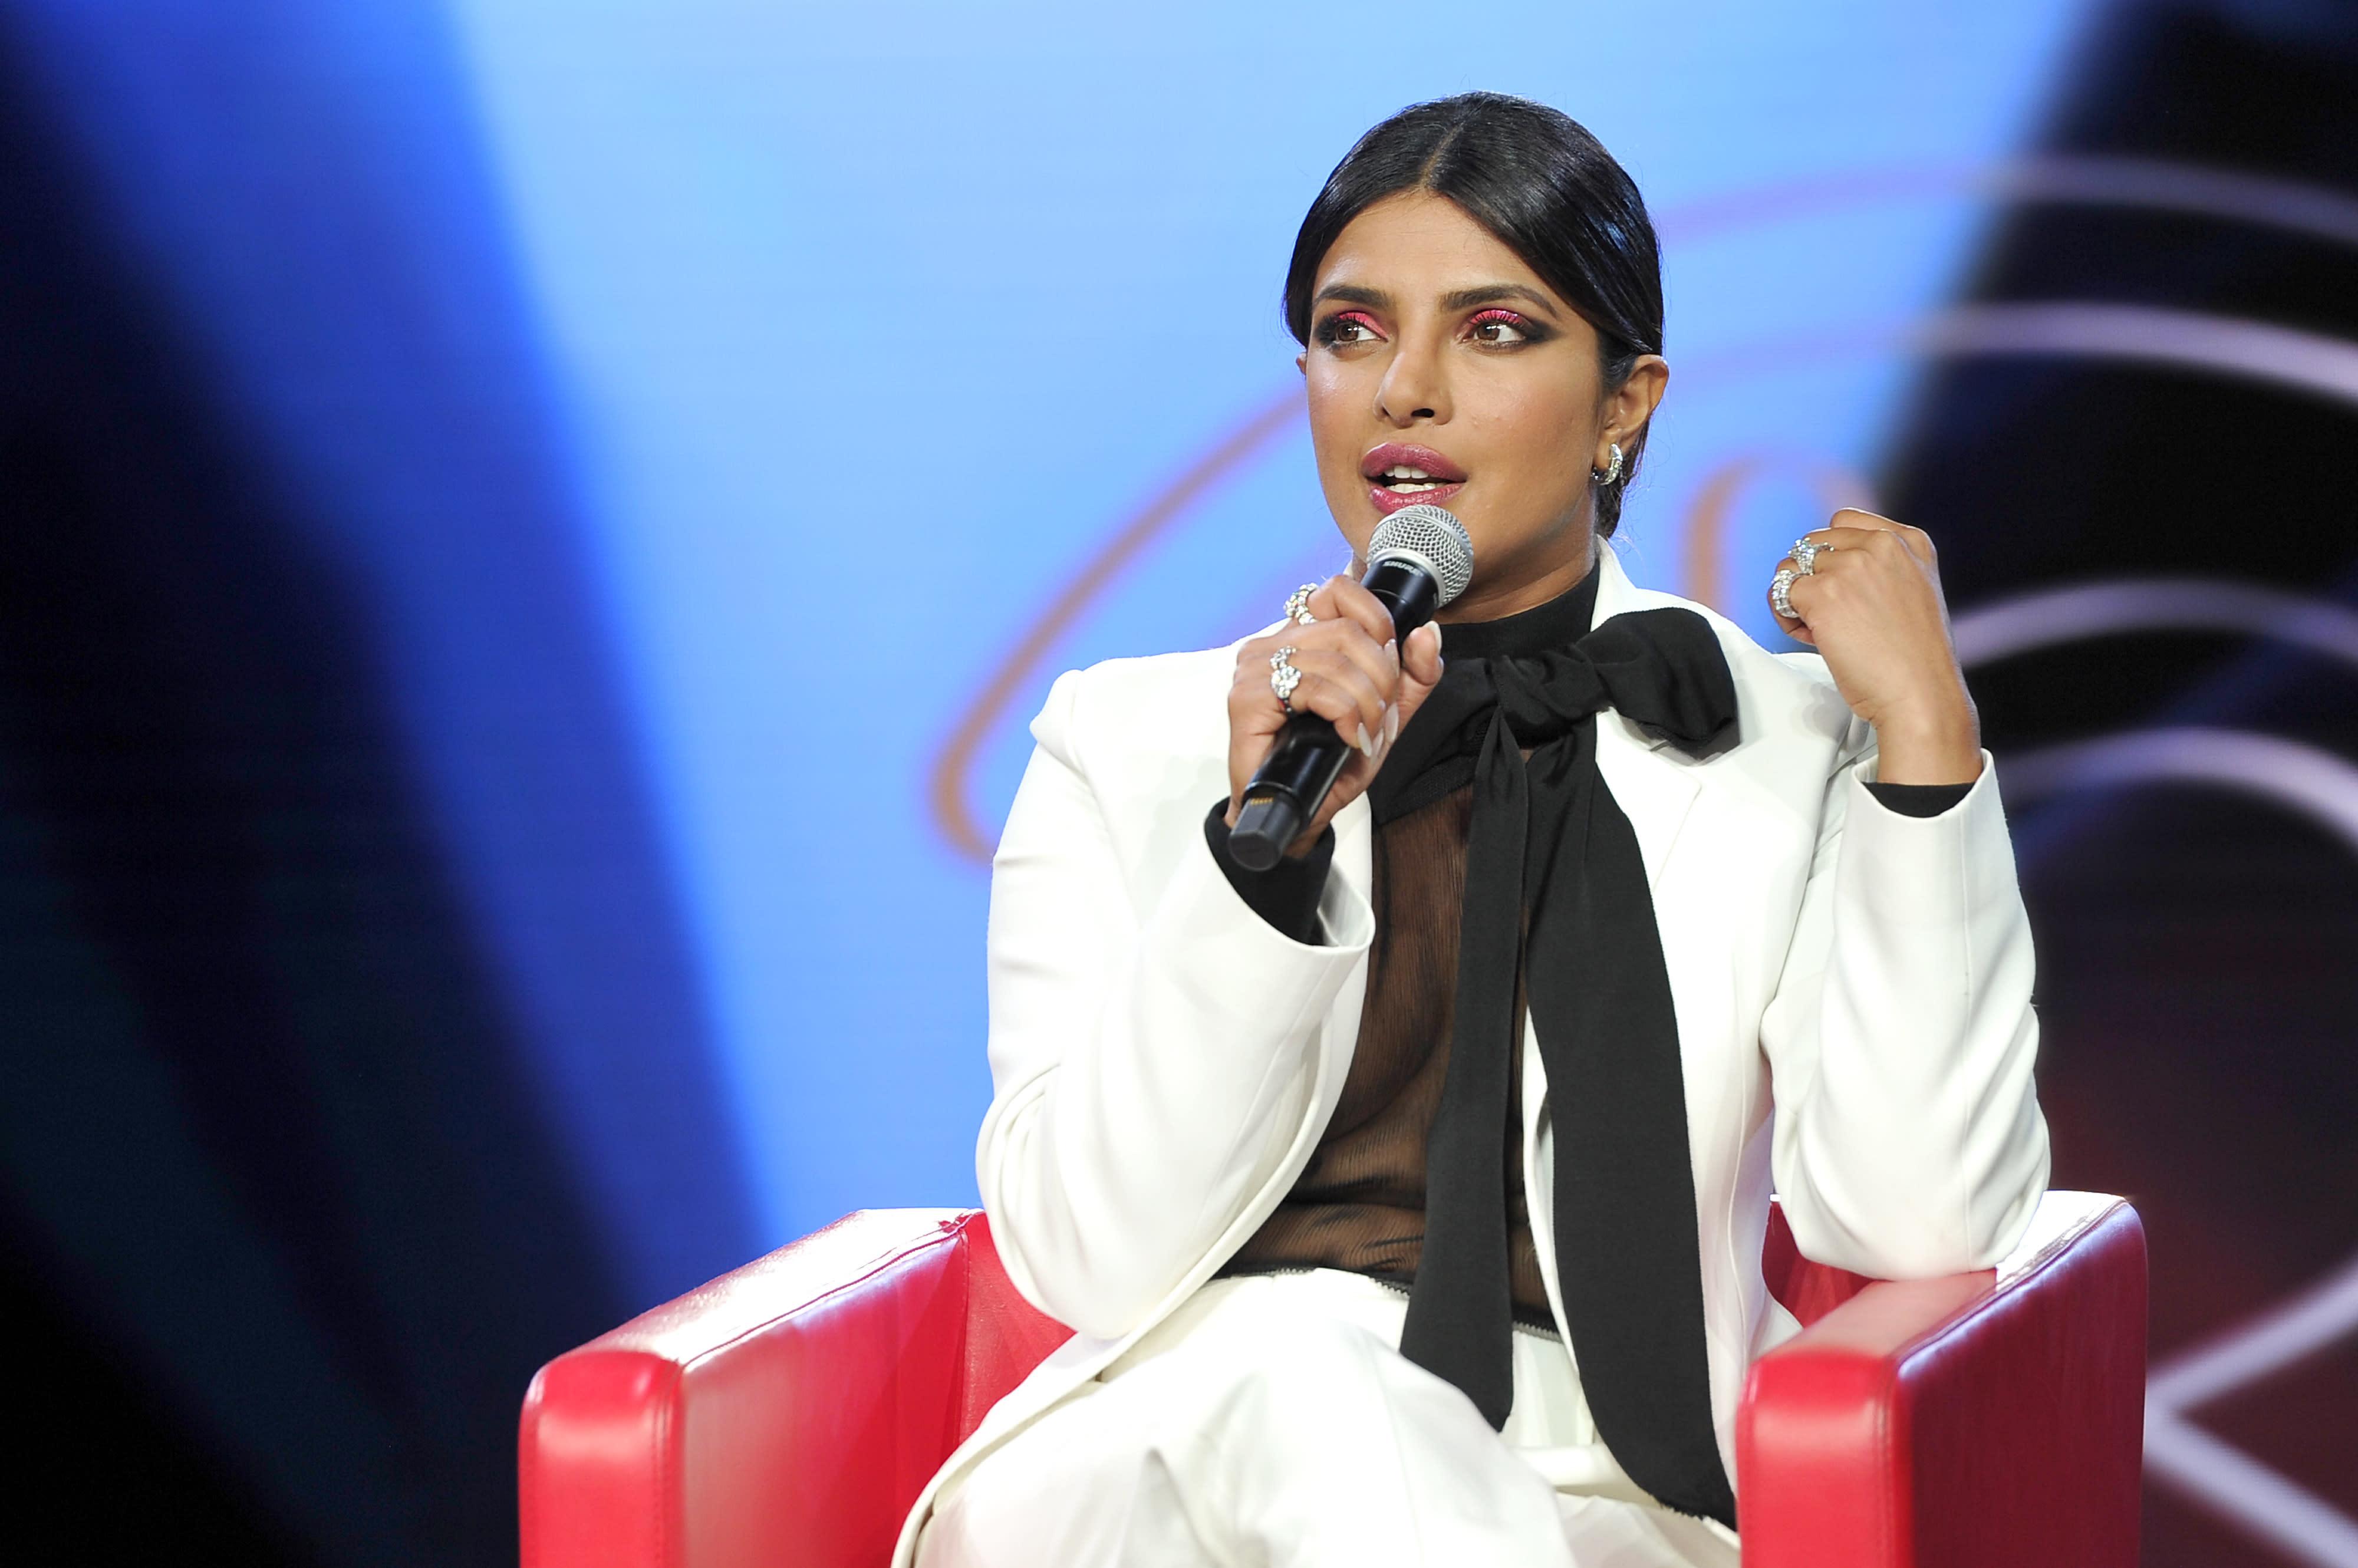 Woman criticizes 'hypocrite' Priyanka Chopra at Beautycon, accuses